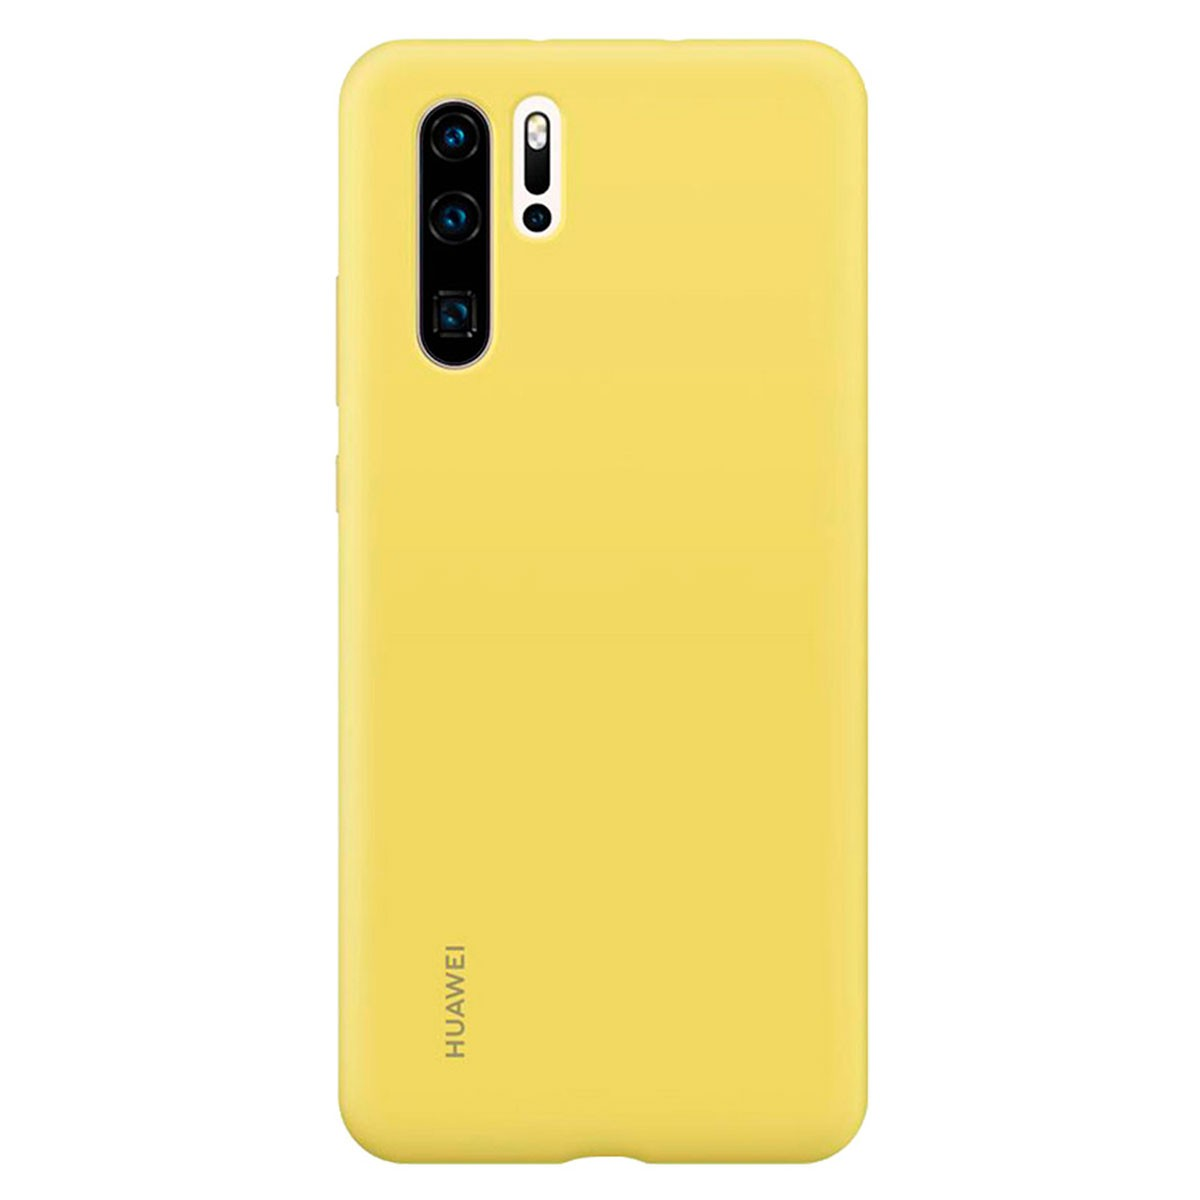 Capa Protetora Silicone Huawei P30 Pro Amarela Original